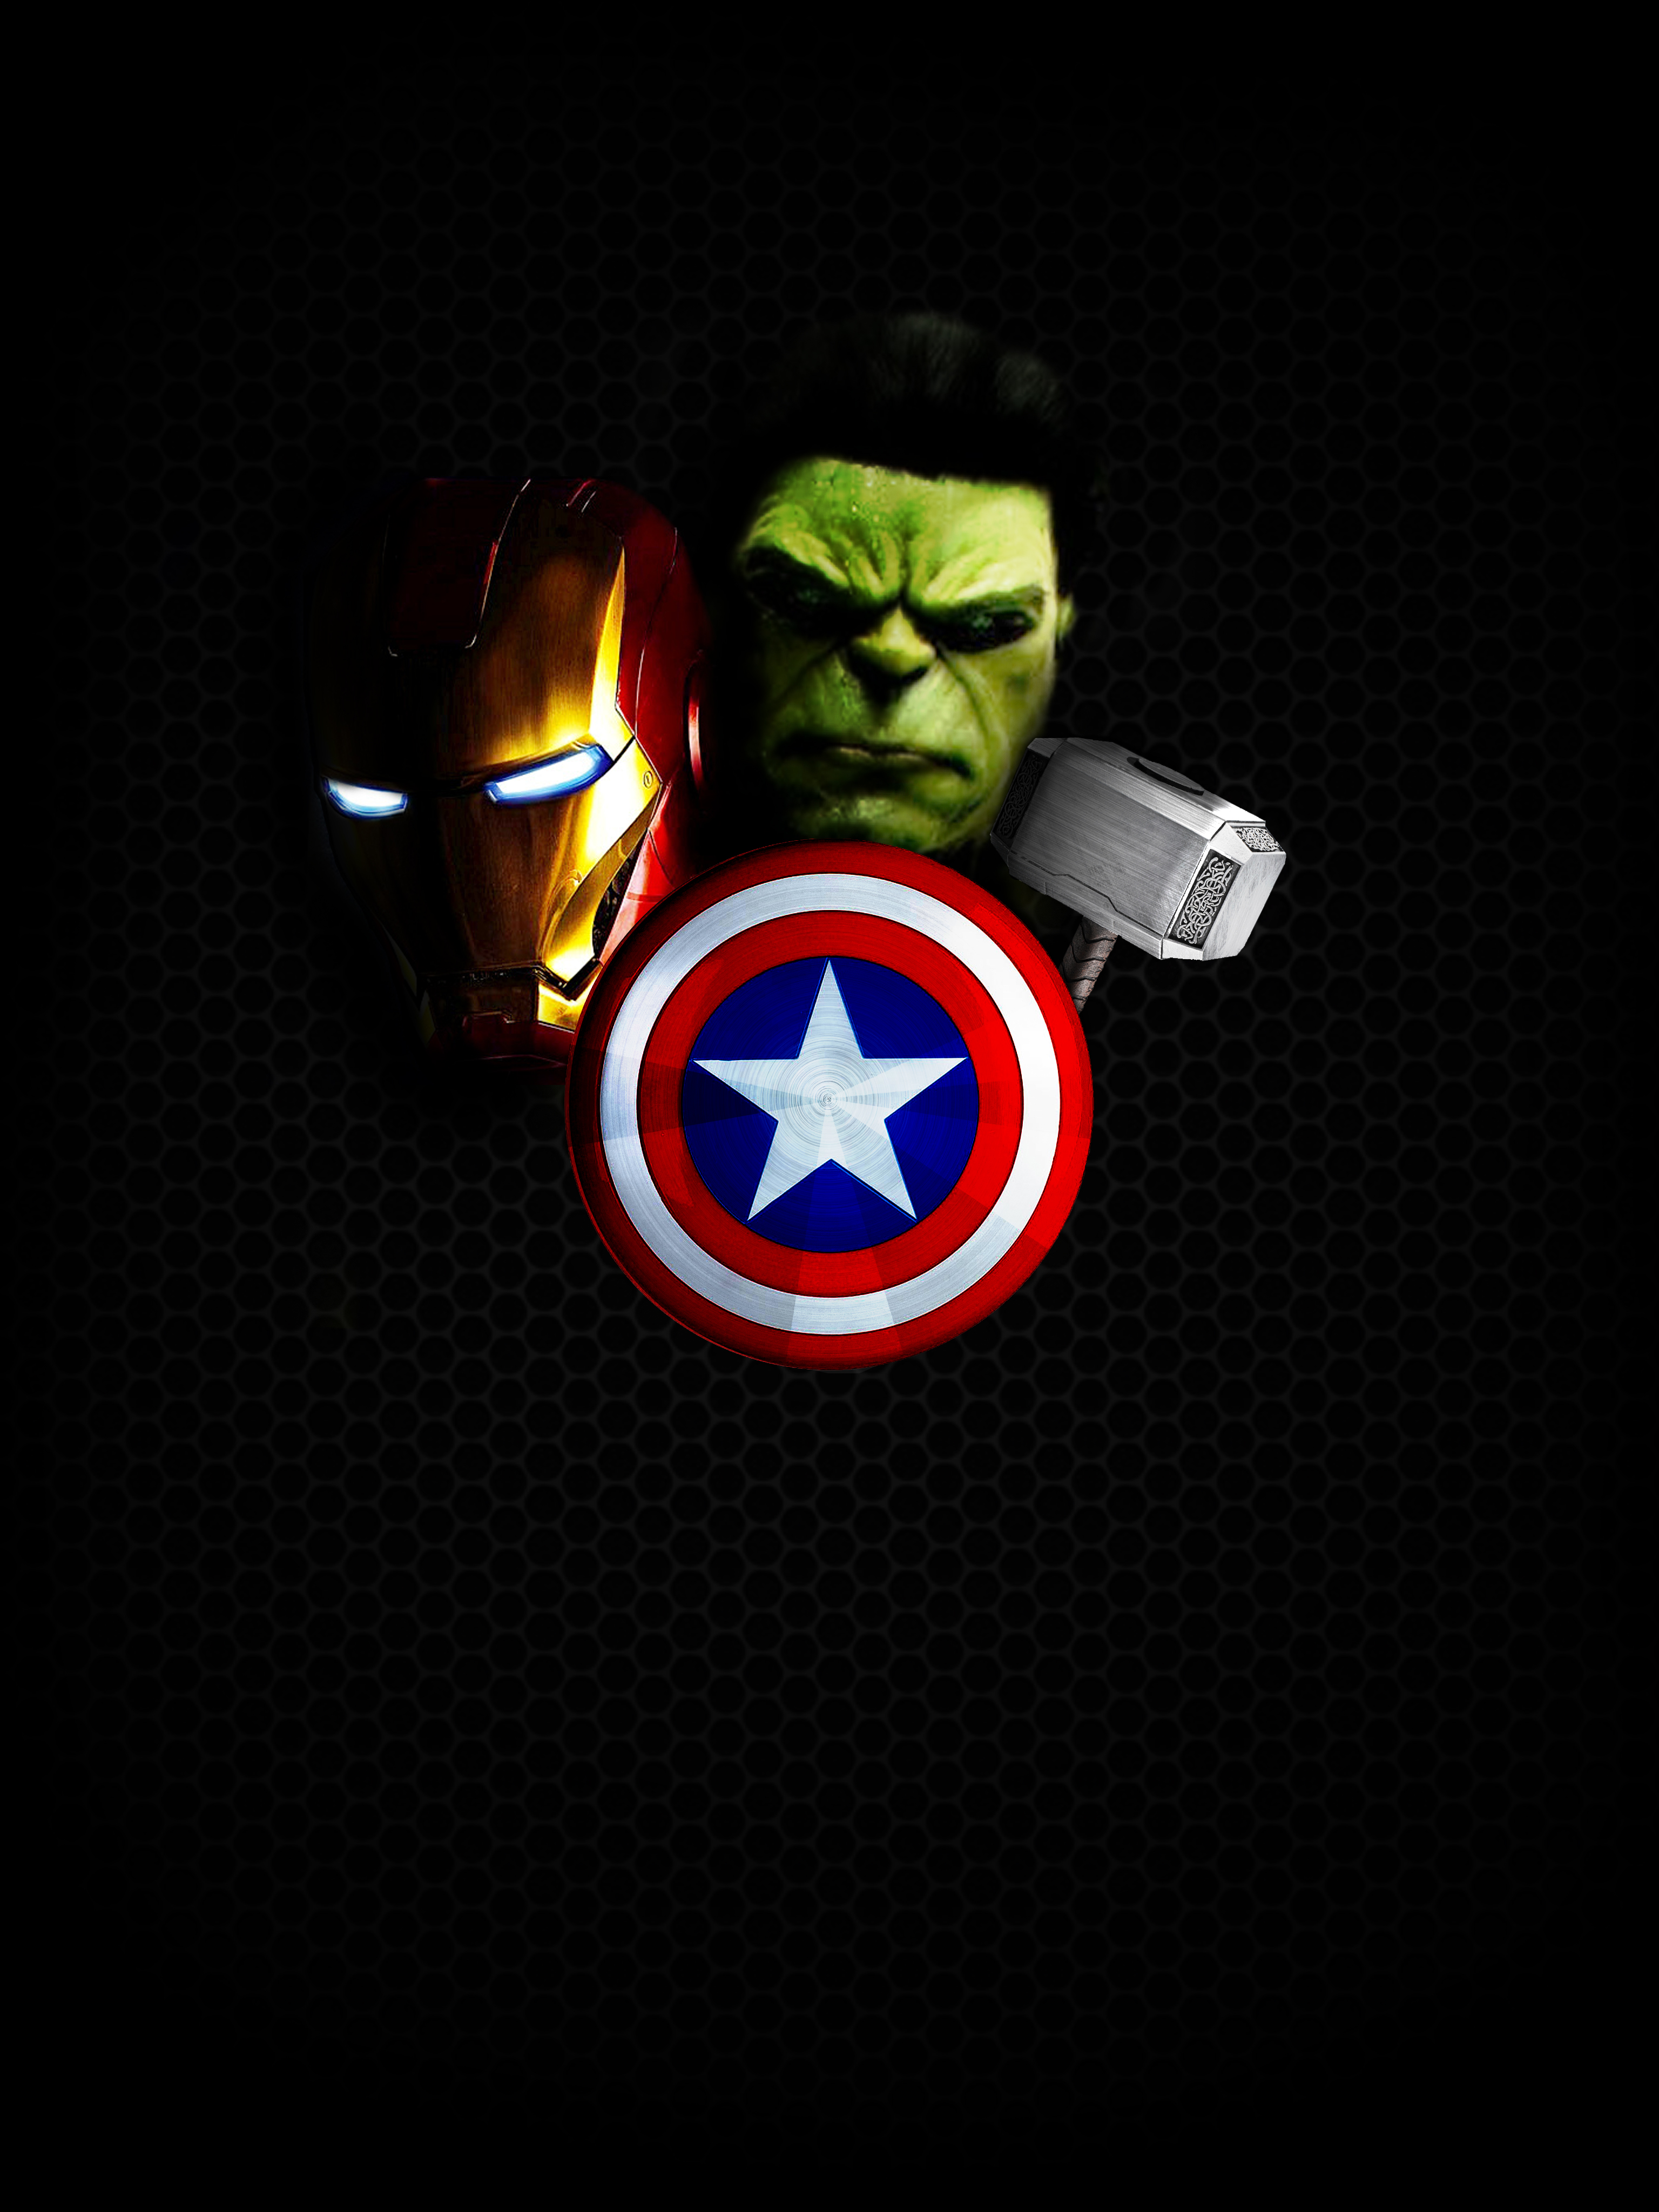 download wallpaper science fiction avengers hd ipad iphone 3072x4096